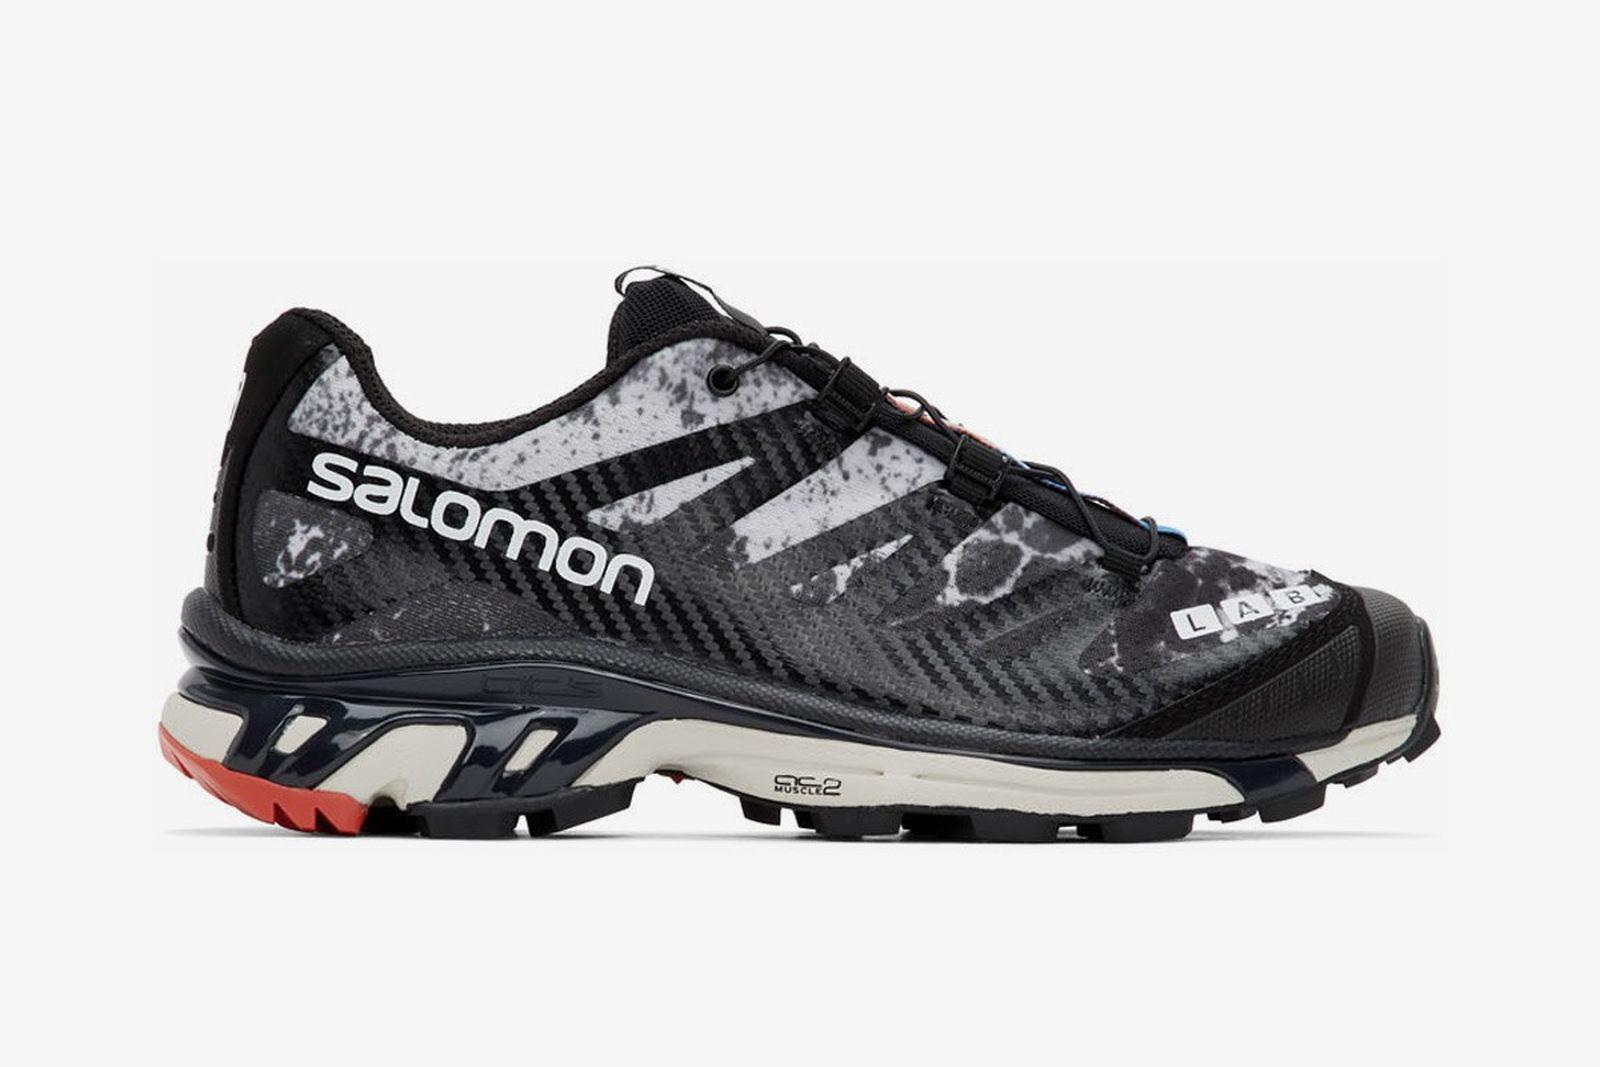 salomon-xt-4-adv-ss20-release-date-price-04